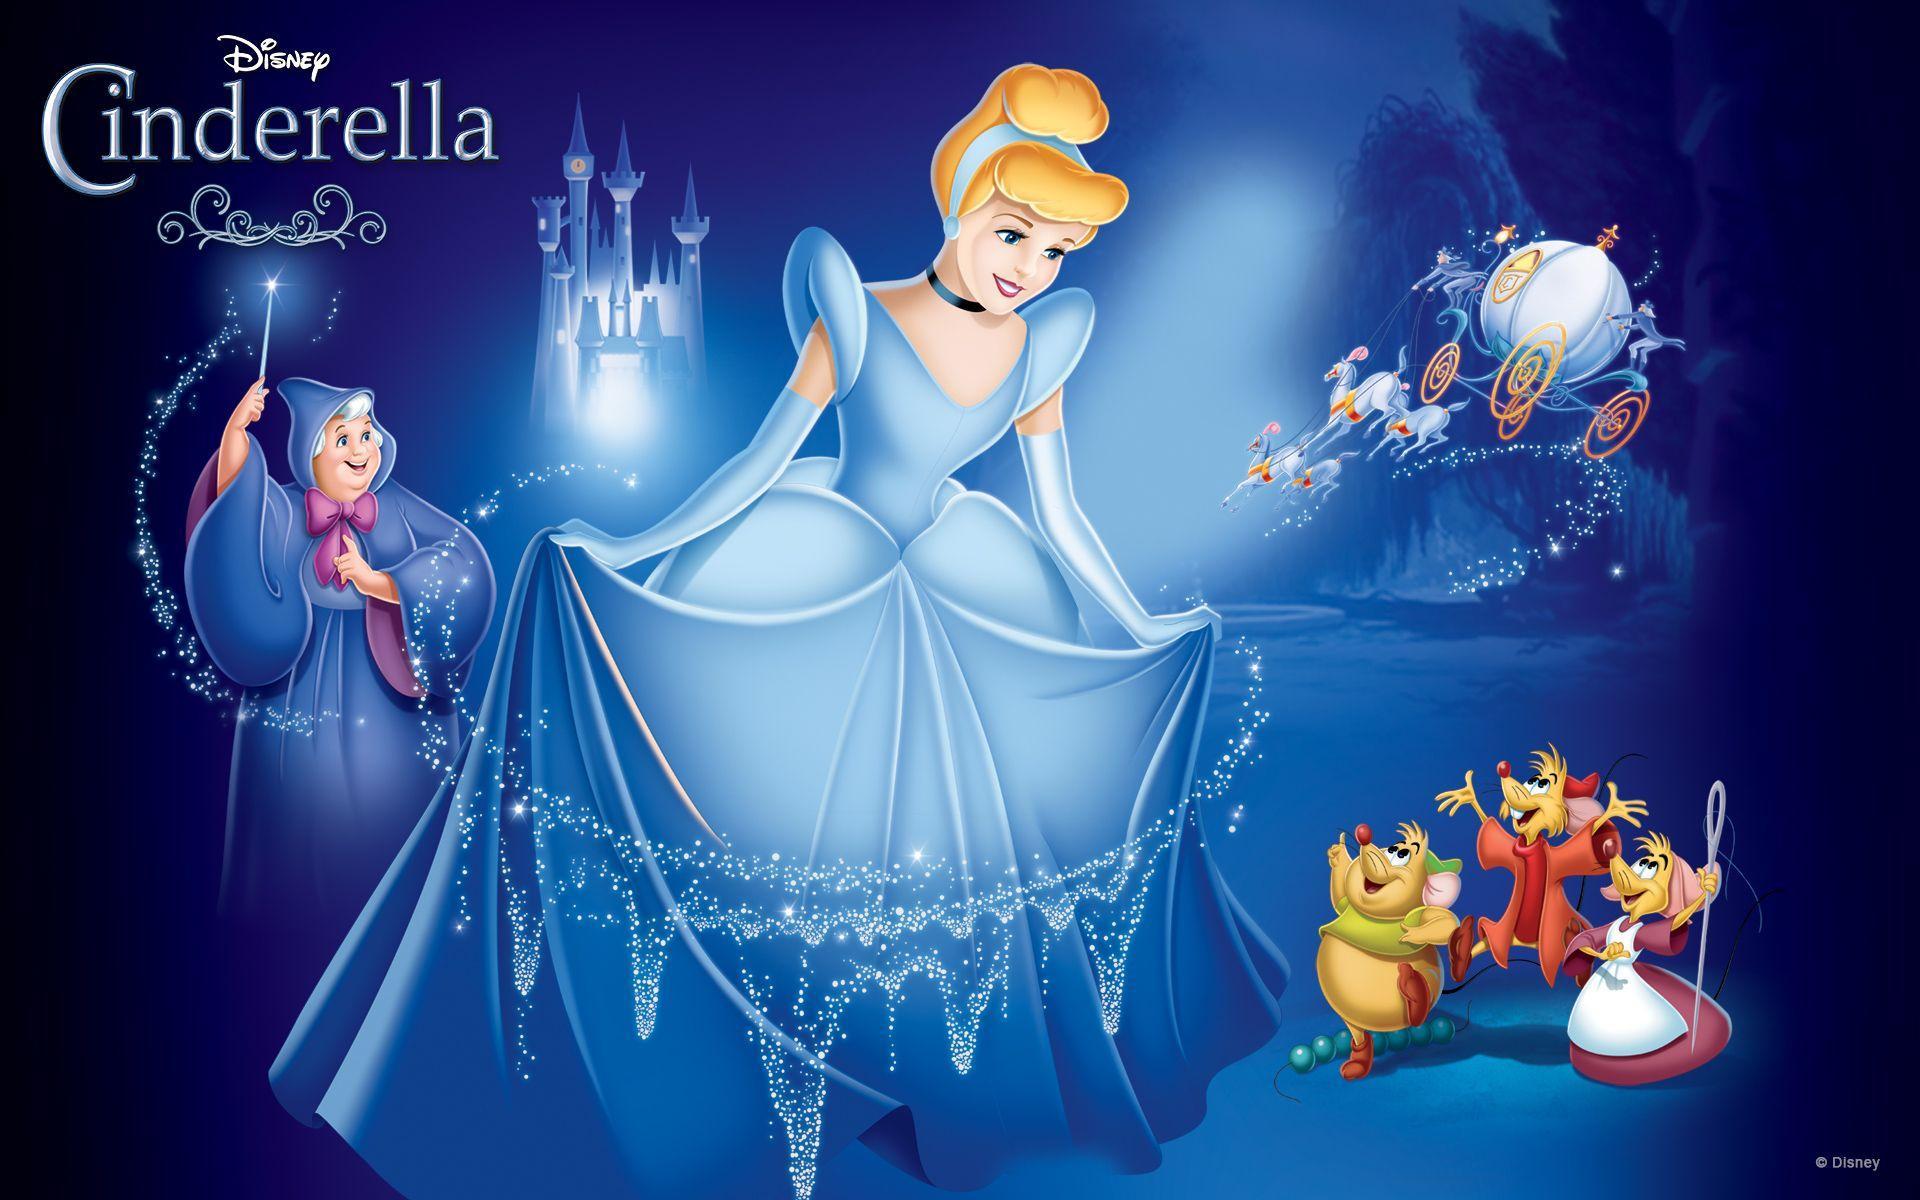 3d Cinderella Wallpapers Top Free 3d Cinderella Backgrounds Wallpaperaccess